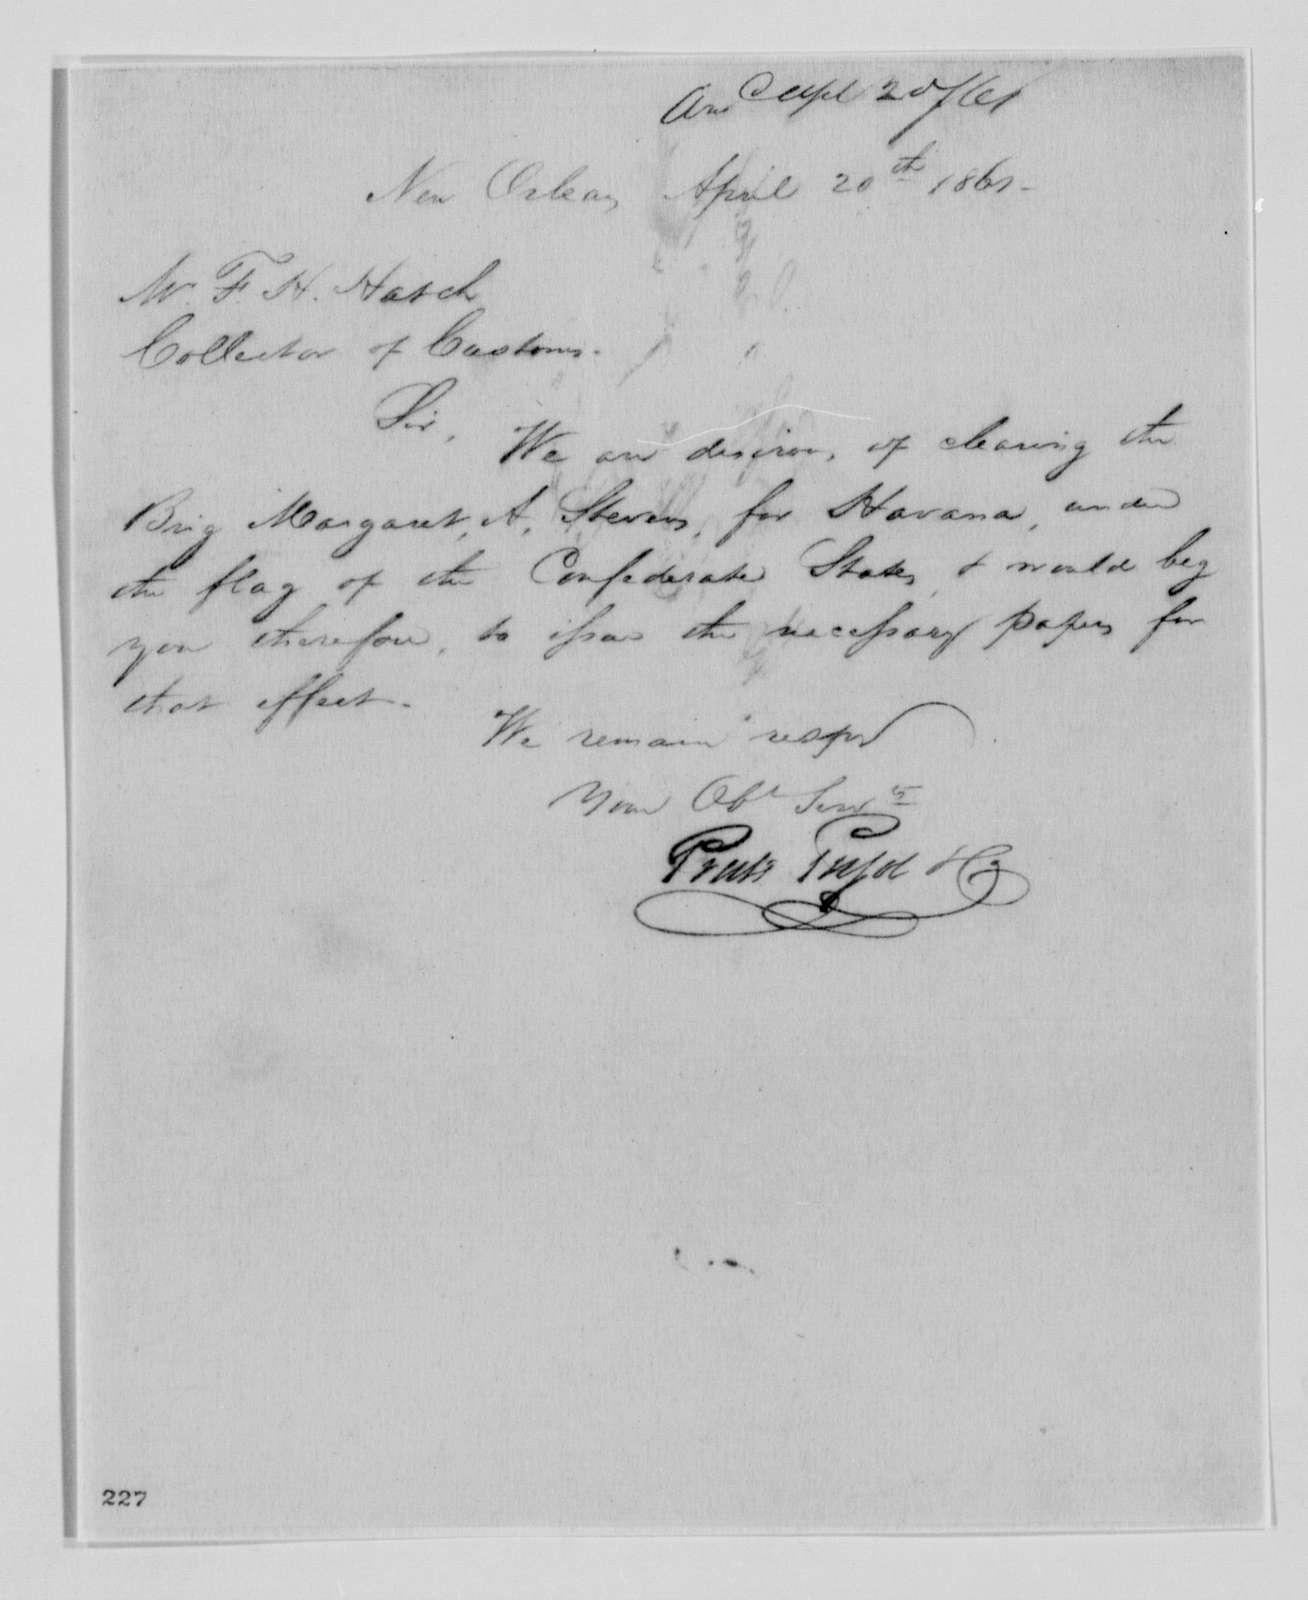 Confederate States of America records: Microfilm Reel 45